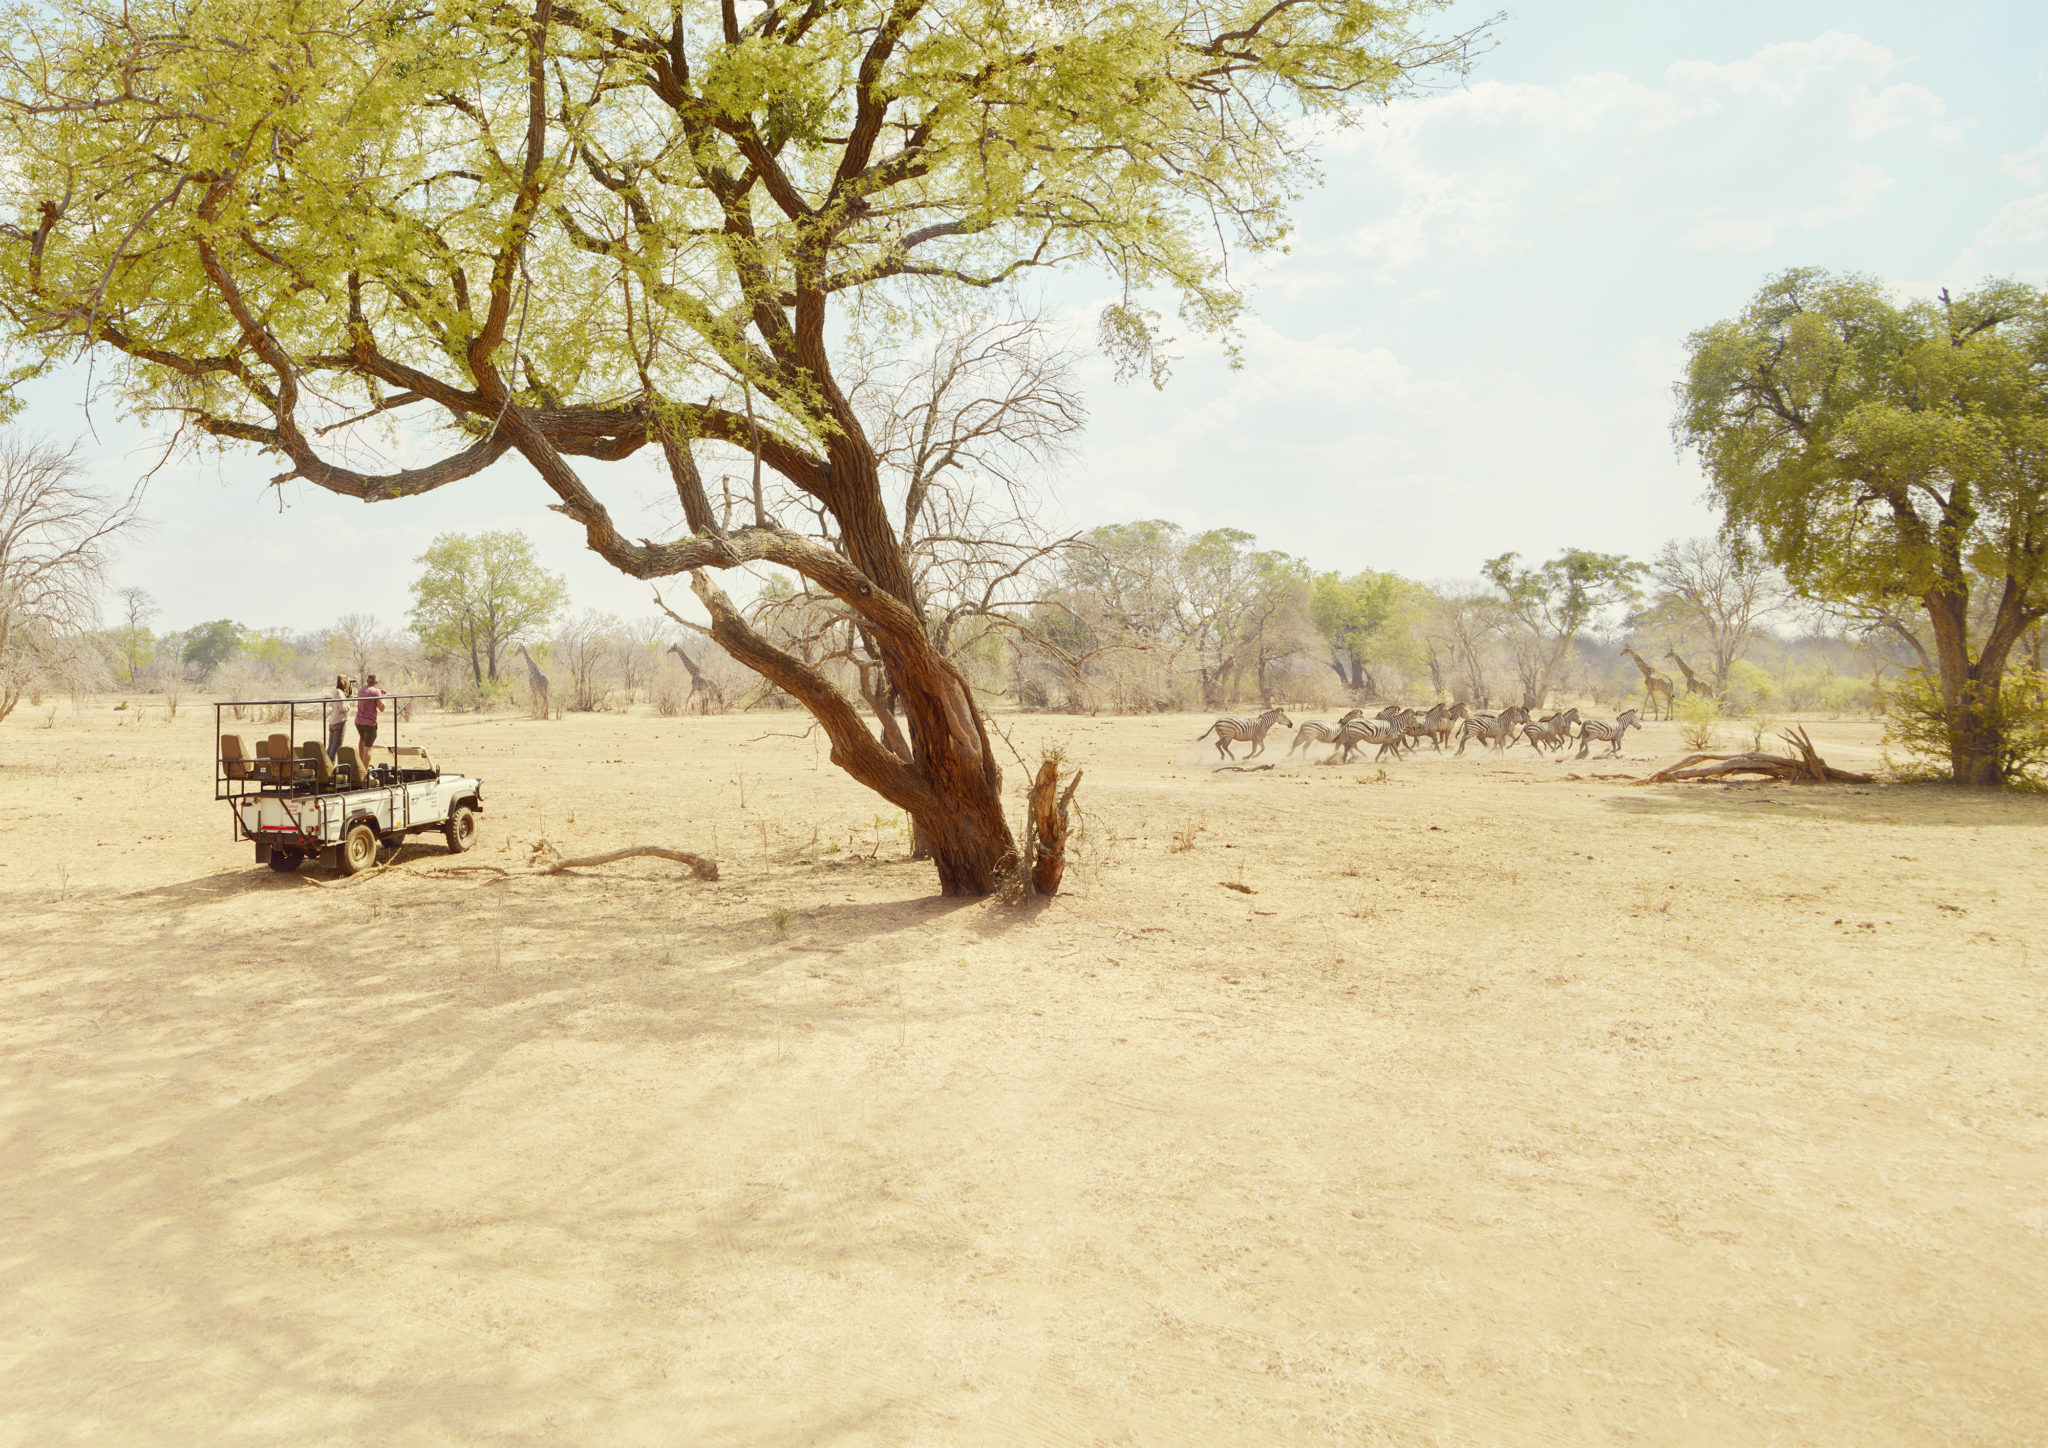 7224_NM_SAGA_Safari_Jeep_r6_Land_crop